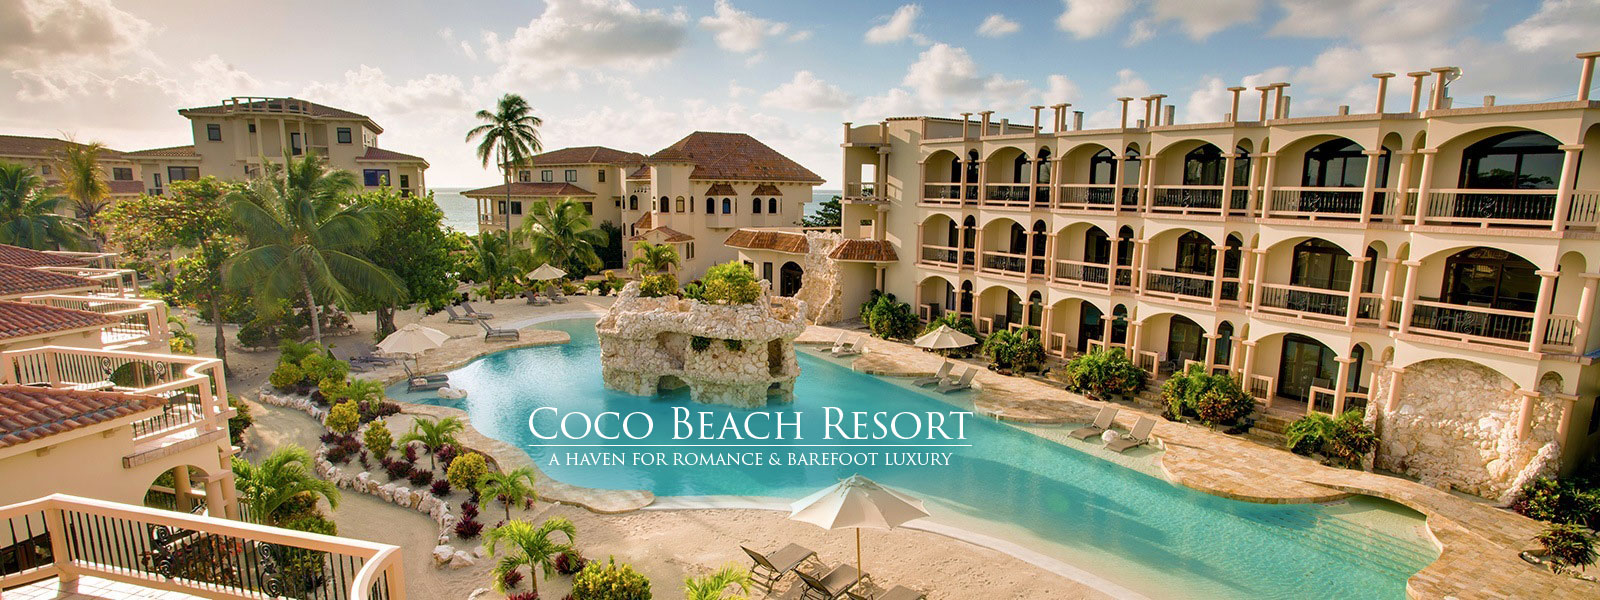 Coco Beach Resort Belize Sandy Point Resorts